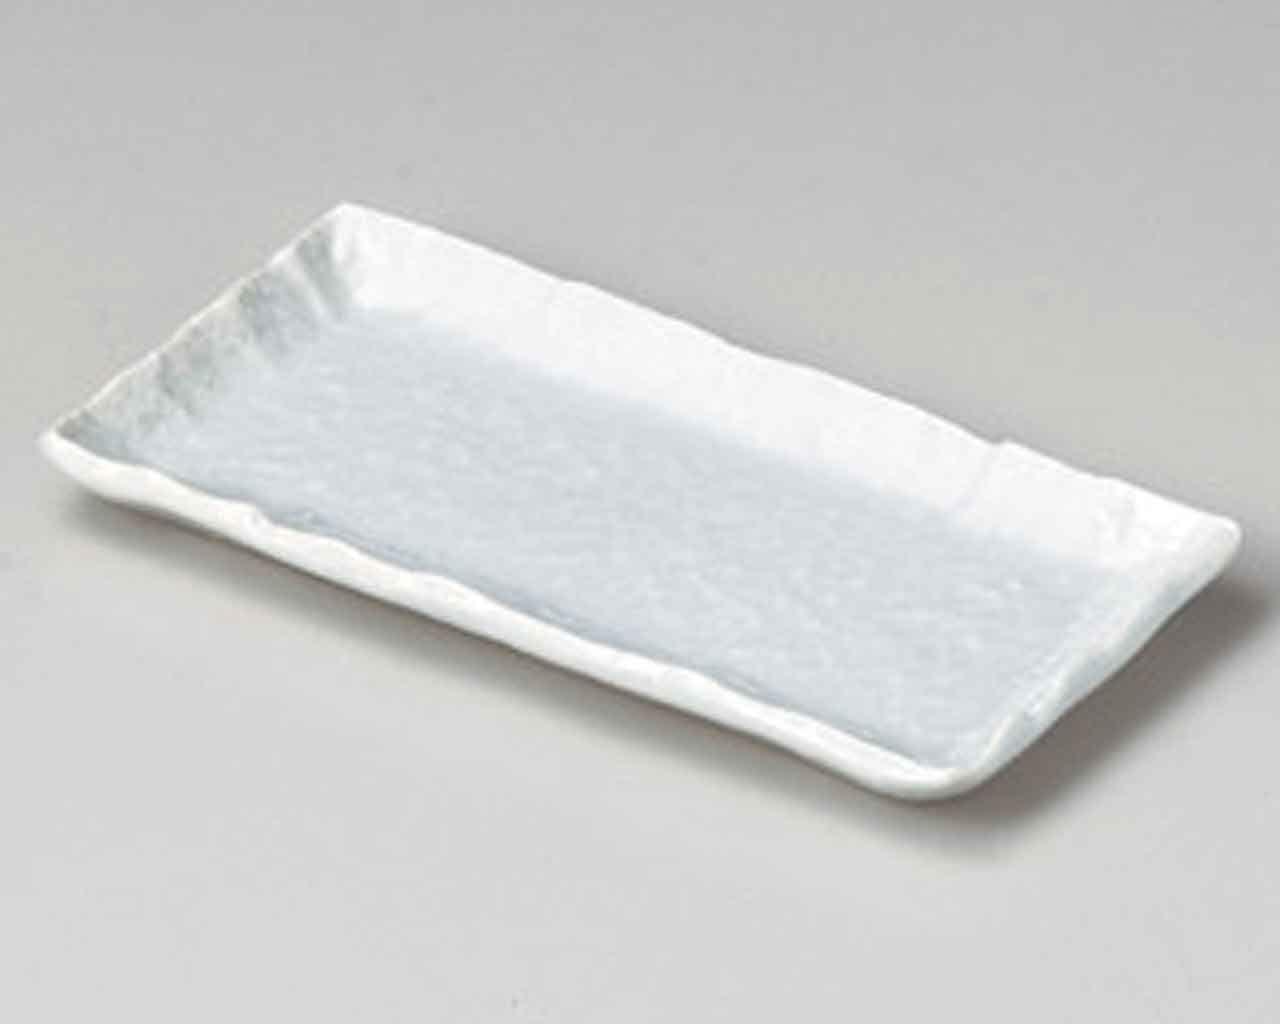 Seihakuji 8.3inch Set of 5 Long Plates Blue porcelain Made in Japan